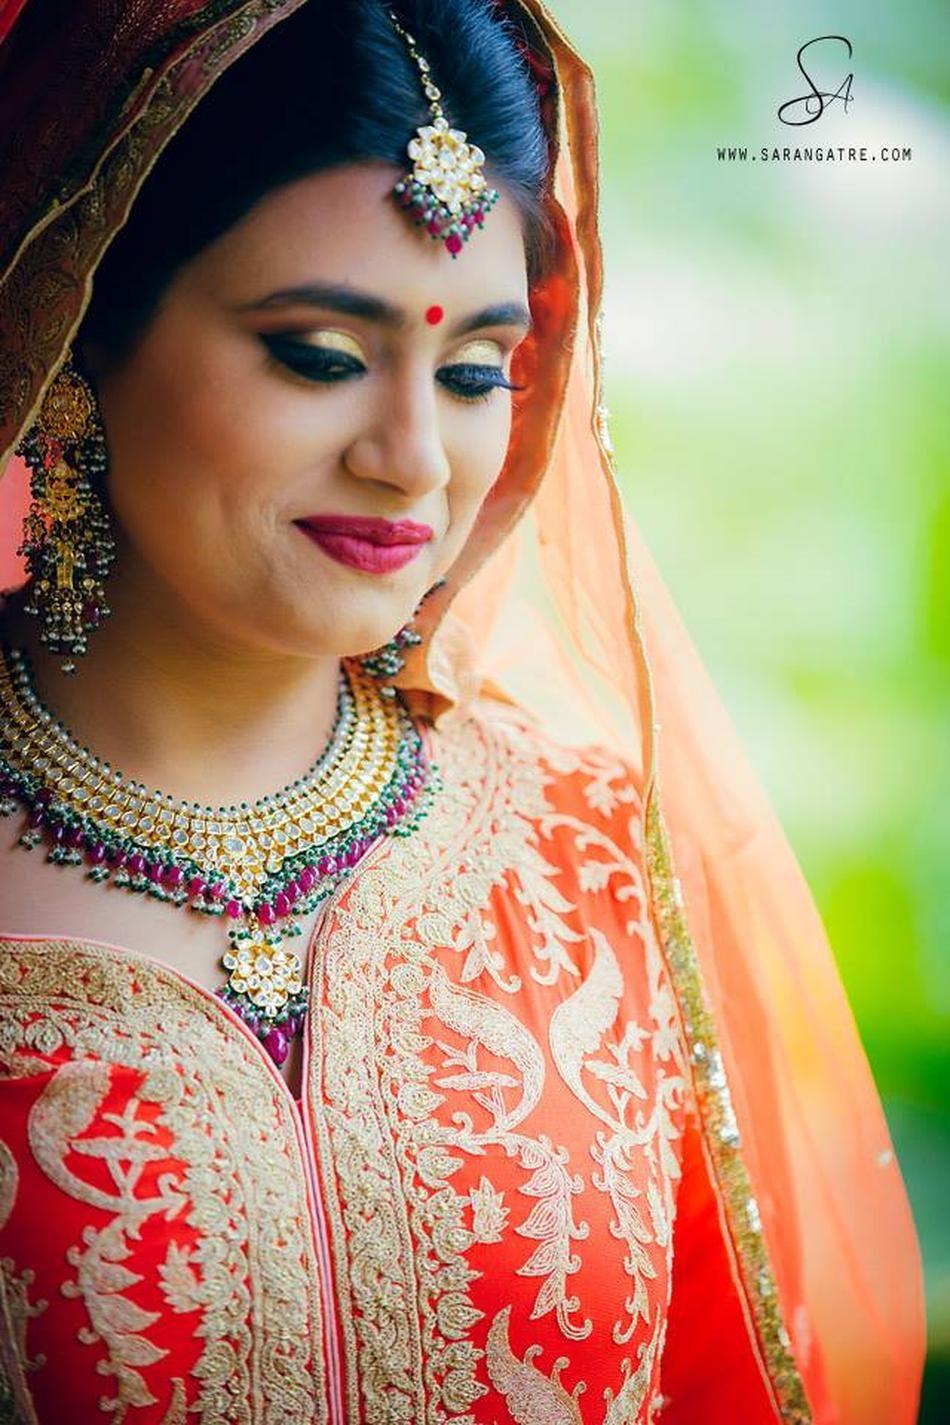 Book Sarang Atre Photography for your wedding photography